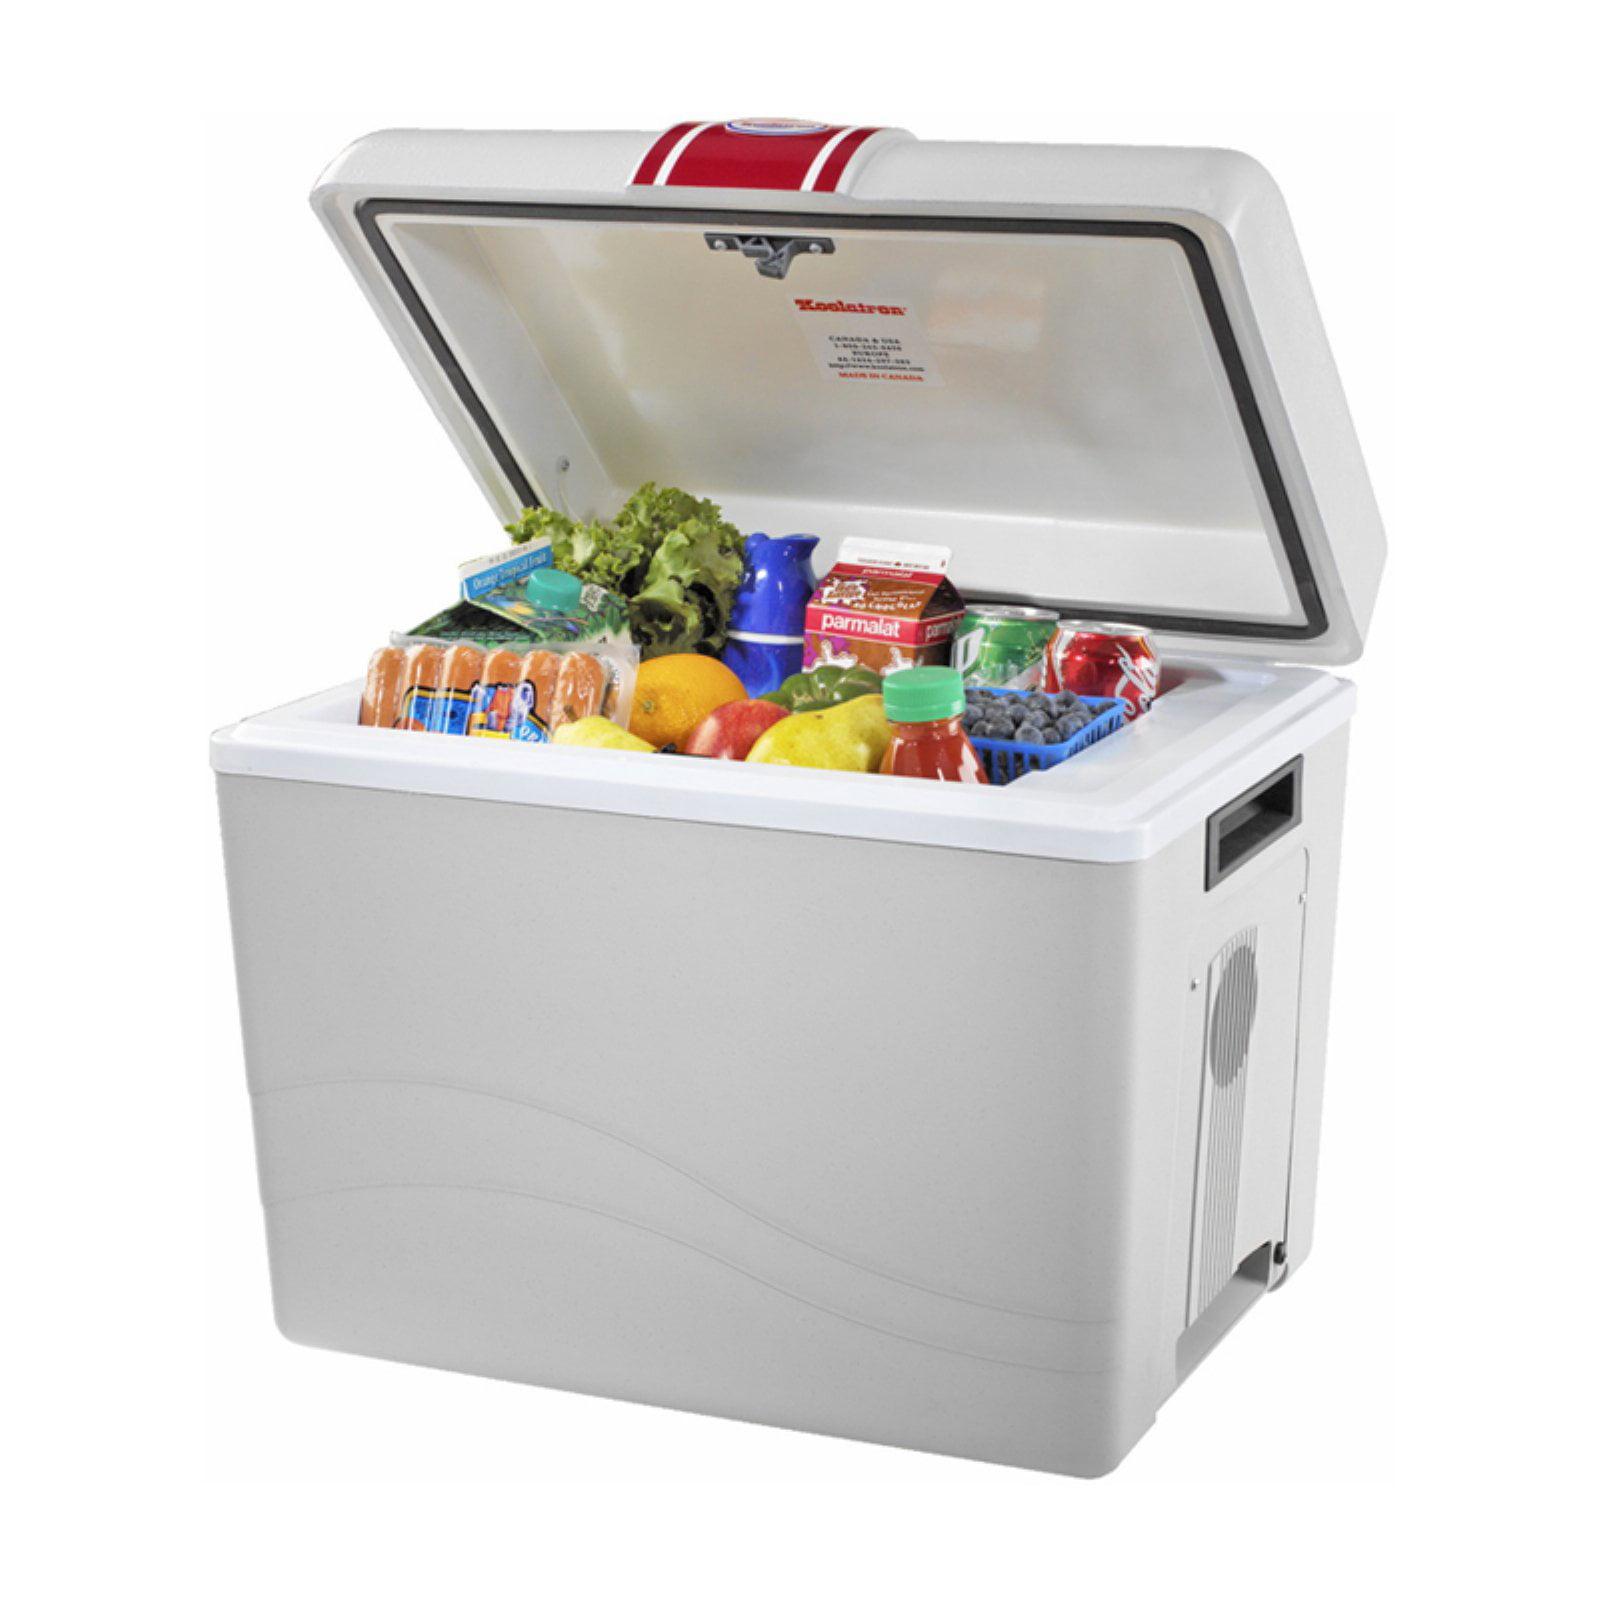 Koolatron P95 45 Quart (43L) 12 Volt Thermoelectric Portable Travel Cooler / Warmer for Cars, RVs, Trucks, Boats